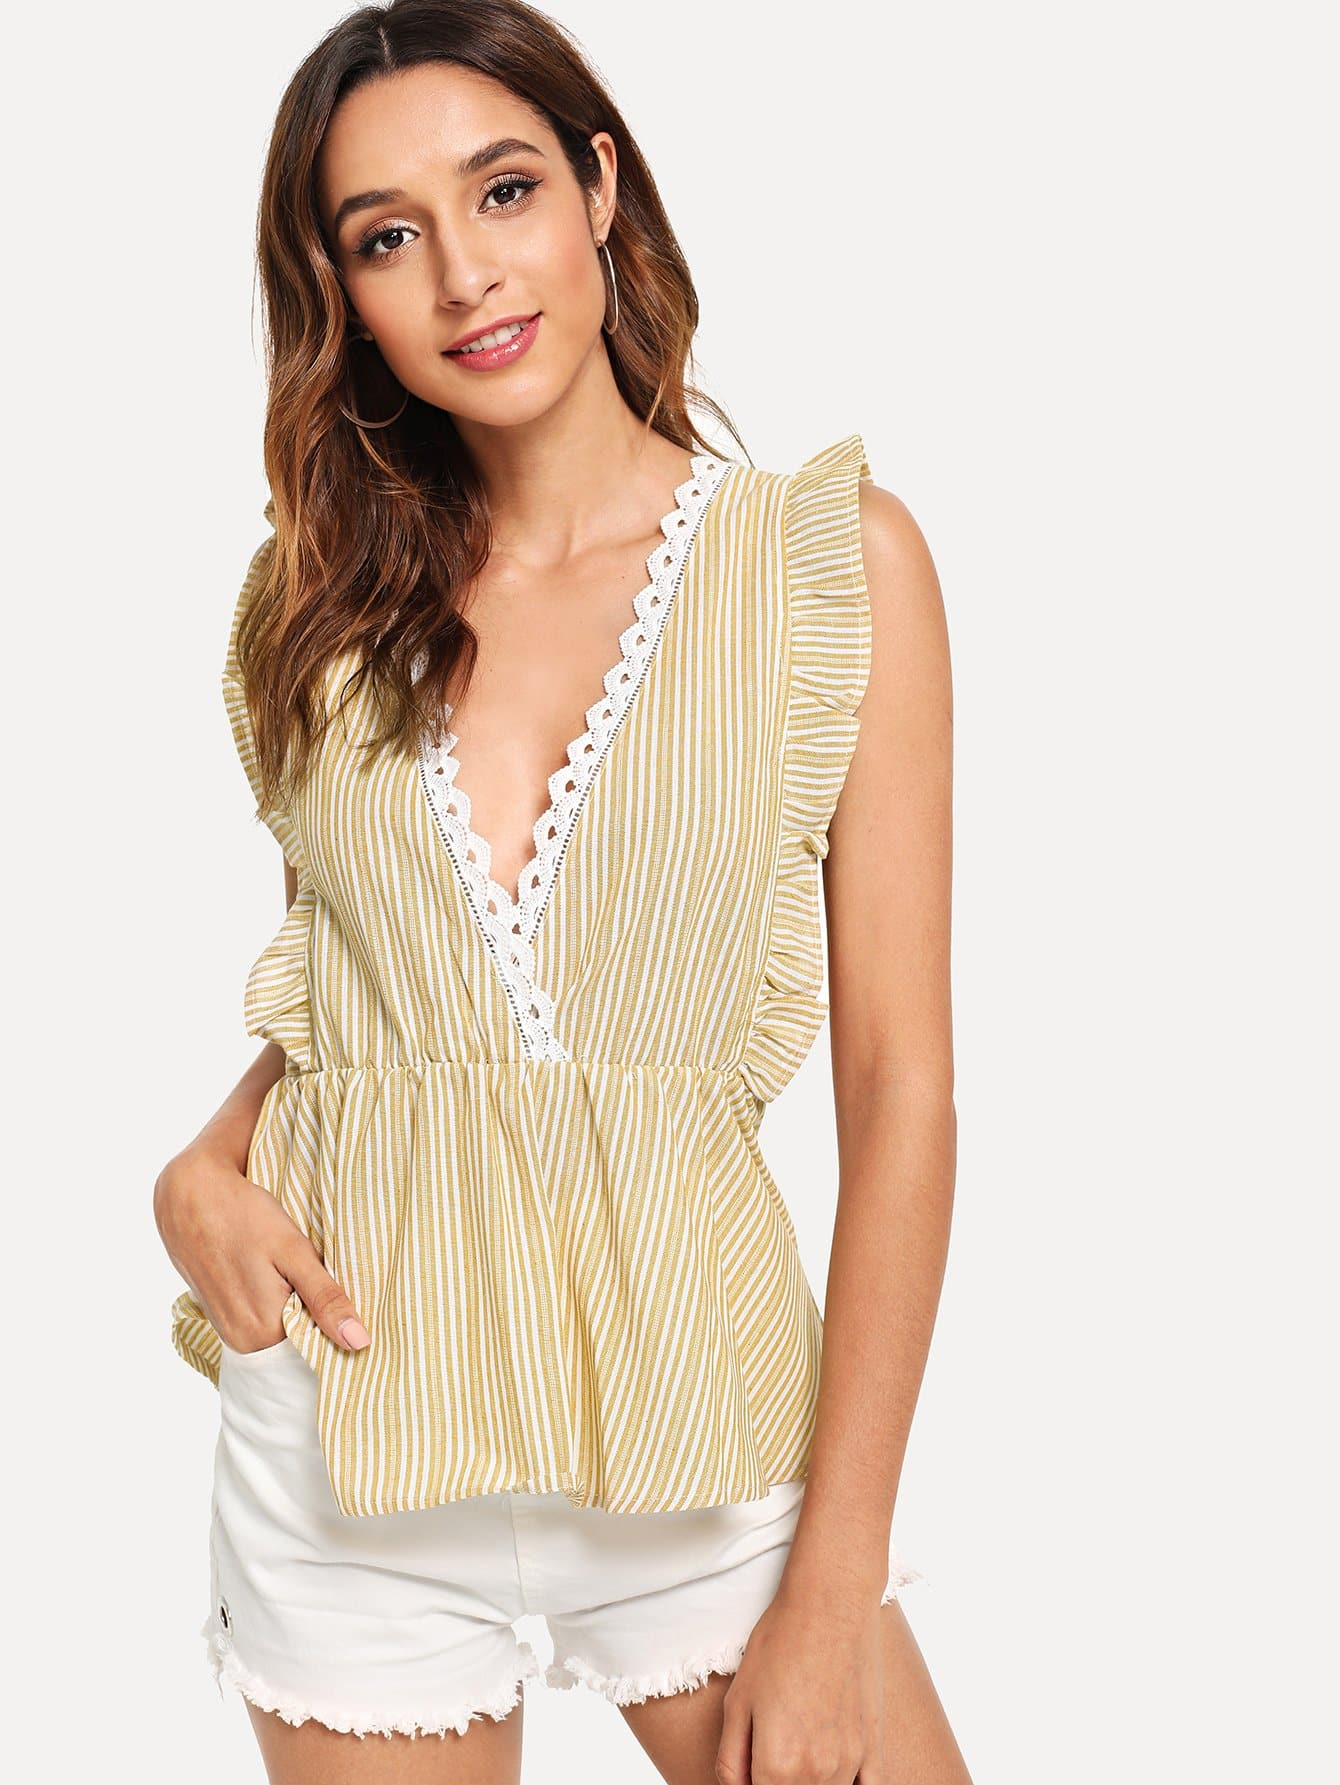 Купить Двухуровневая полосатая полосатая блузка, Gabi B, SheIn